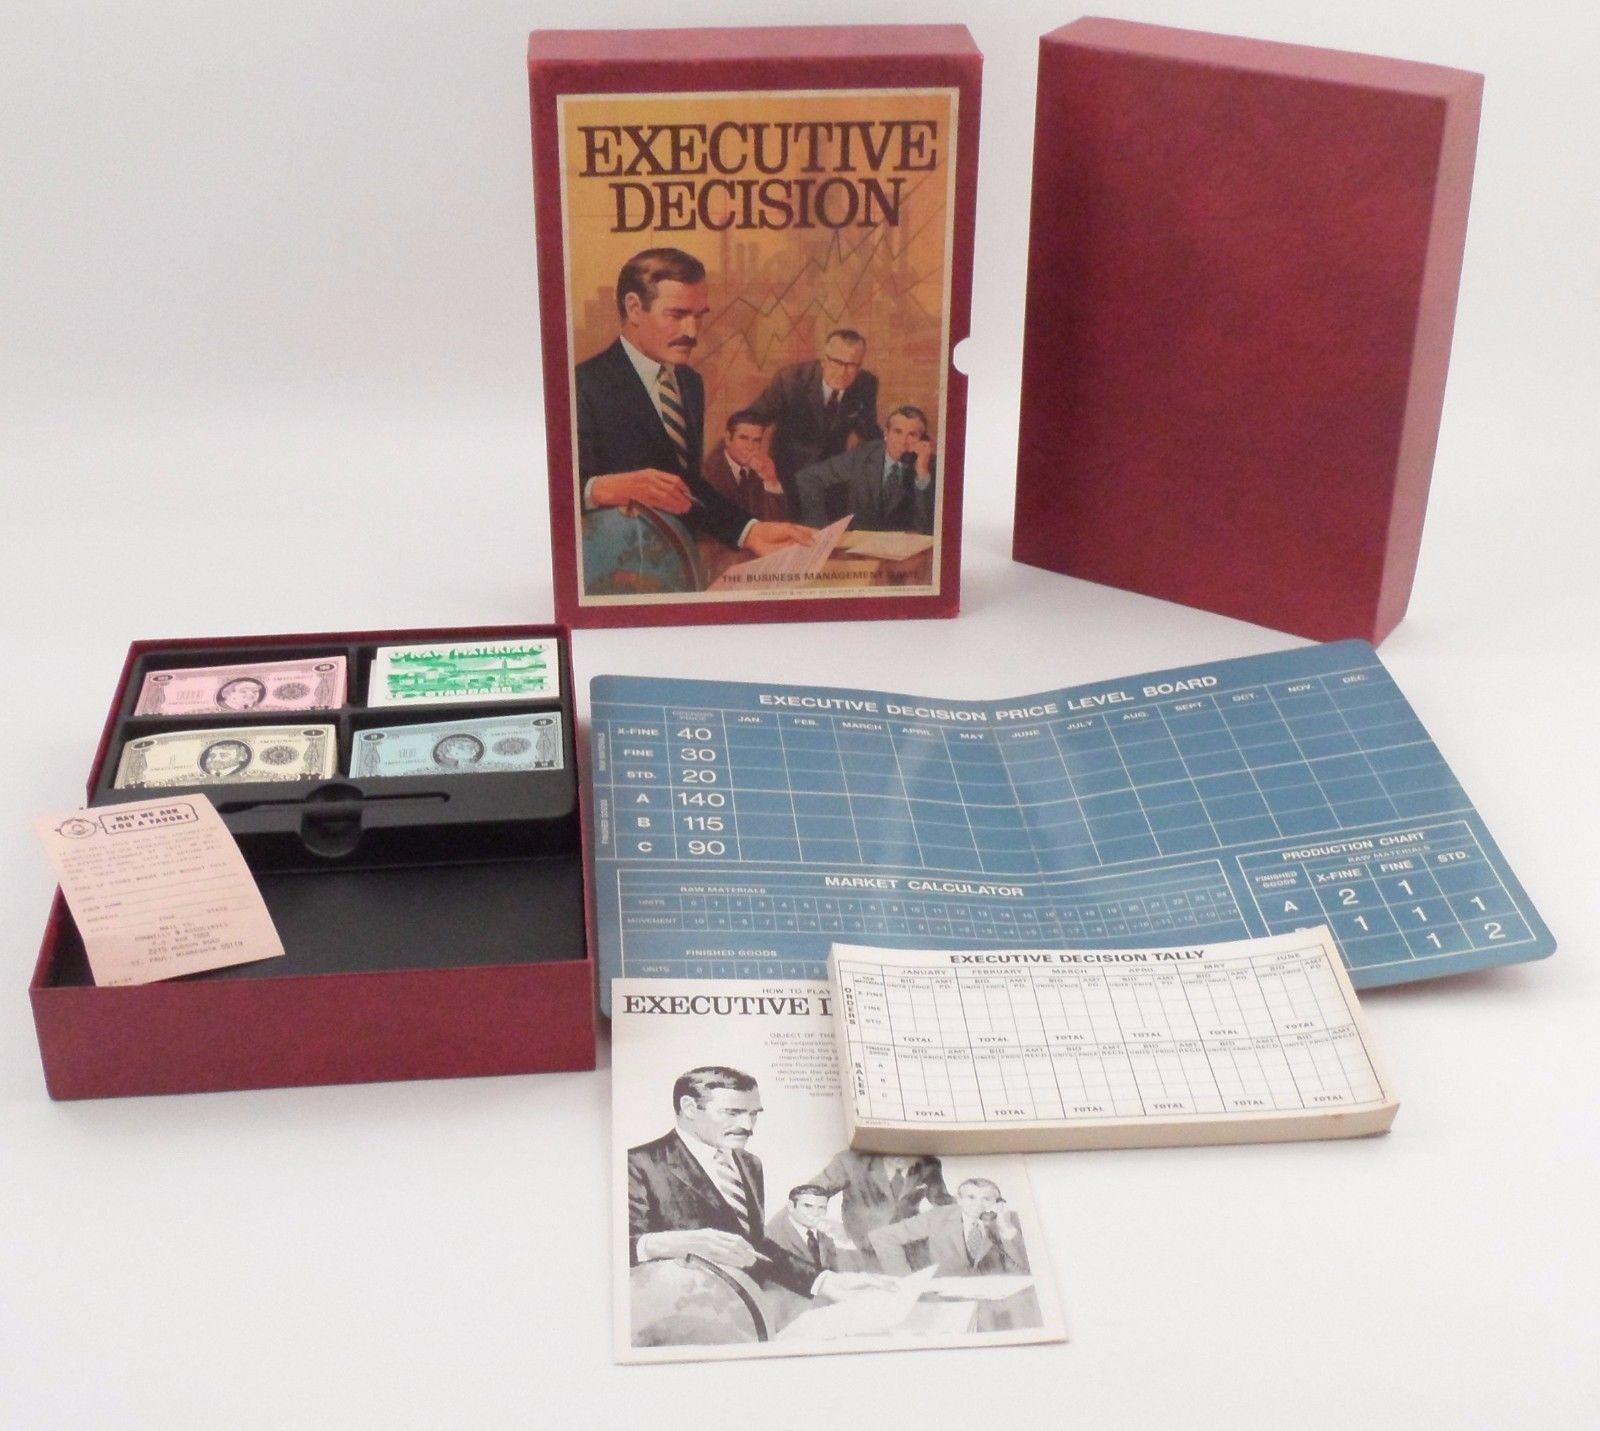 MIB Unplayed 1971 3M Bookshelf Game - Executive Decision Big Business Management - $22.23